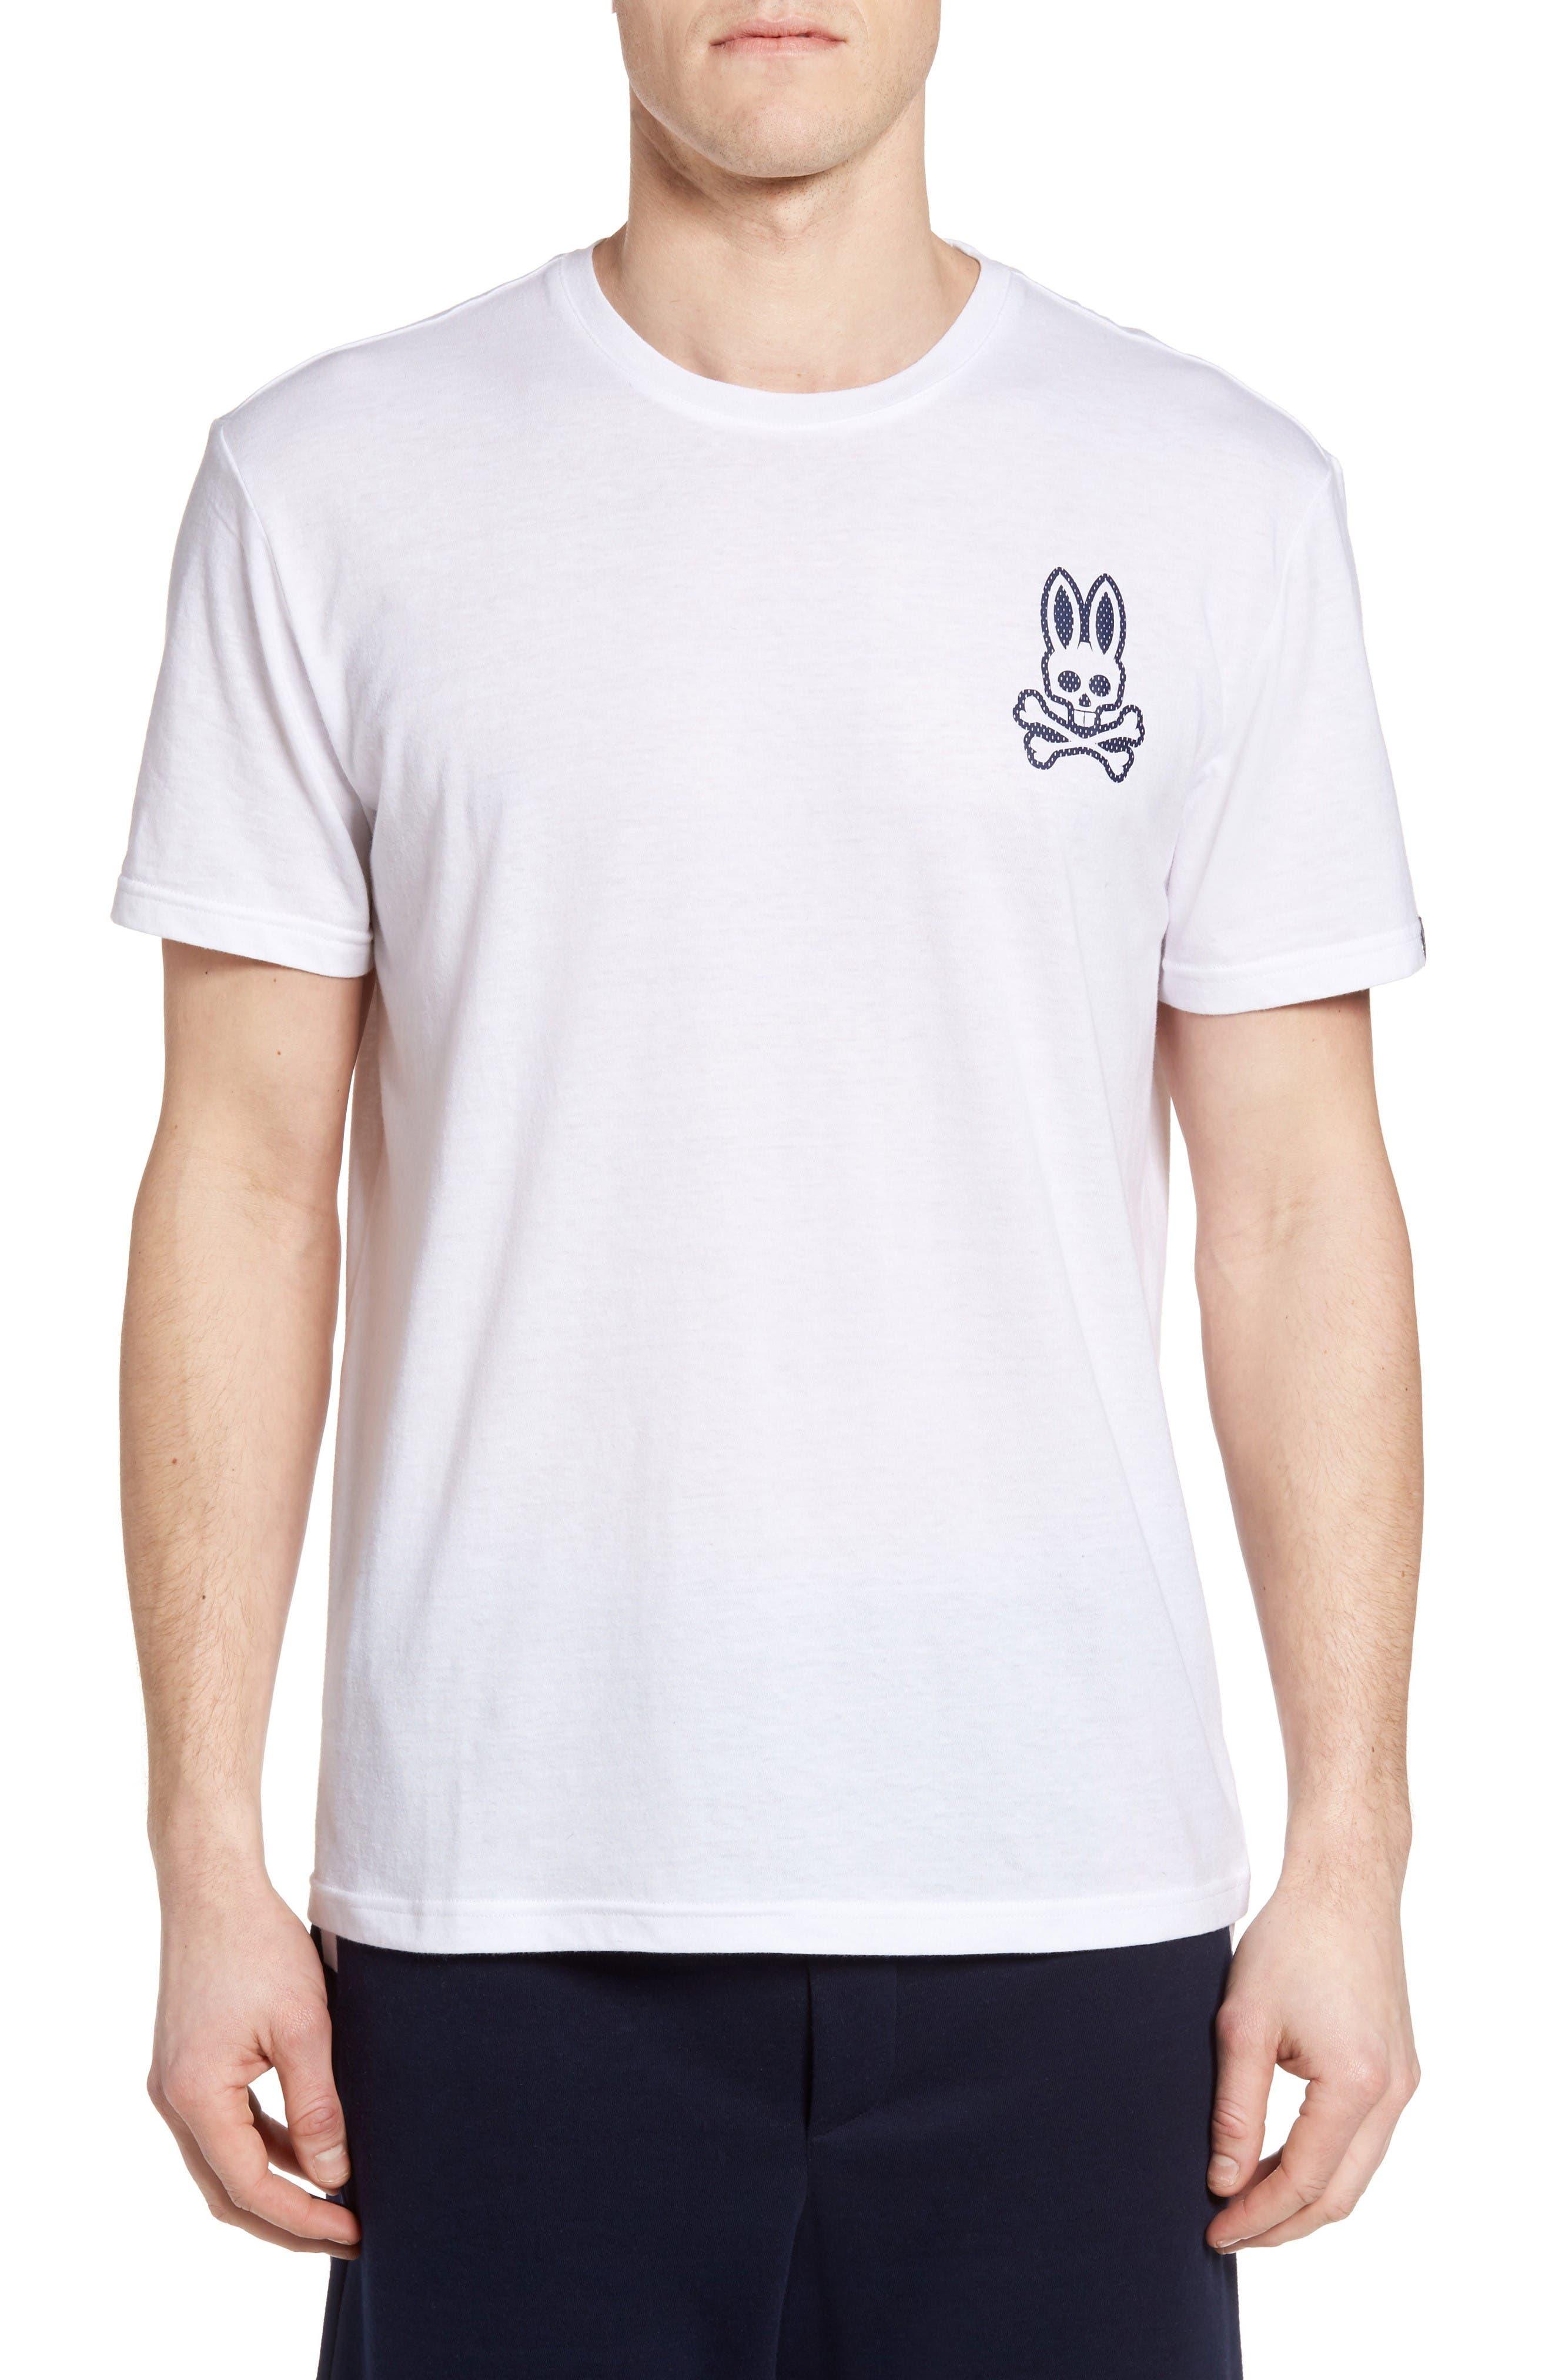 Psycho Bunny Crewneck Lounge T-Shirt